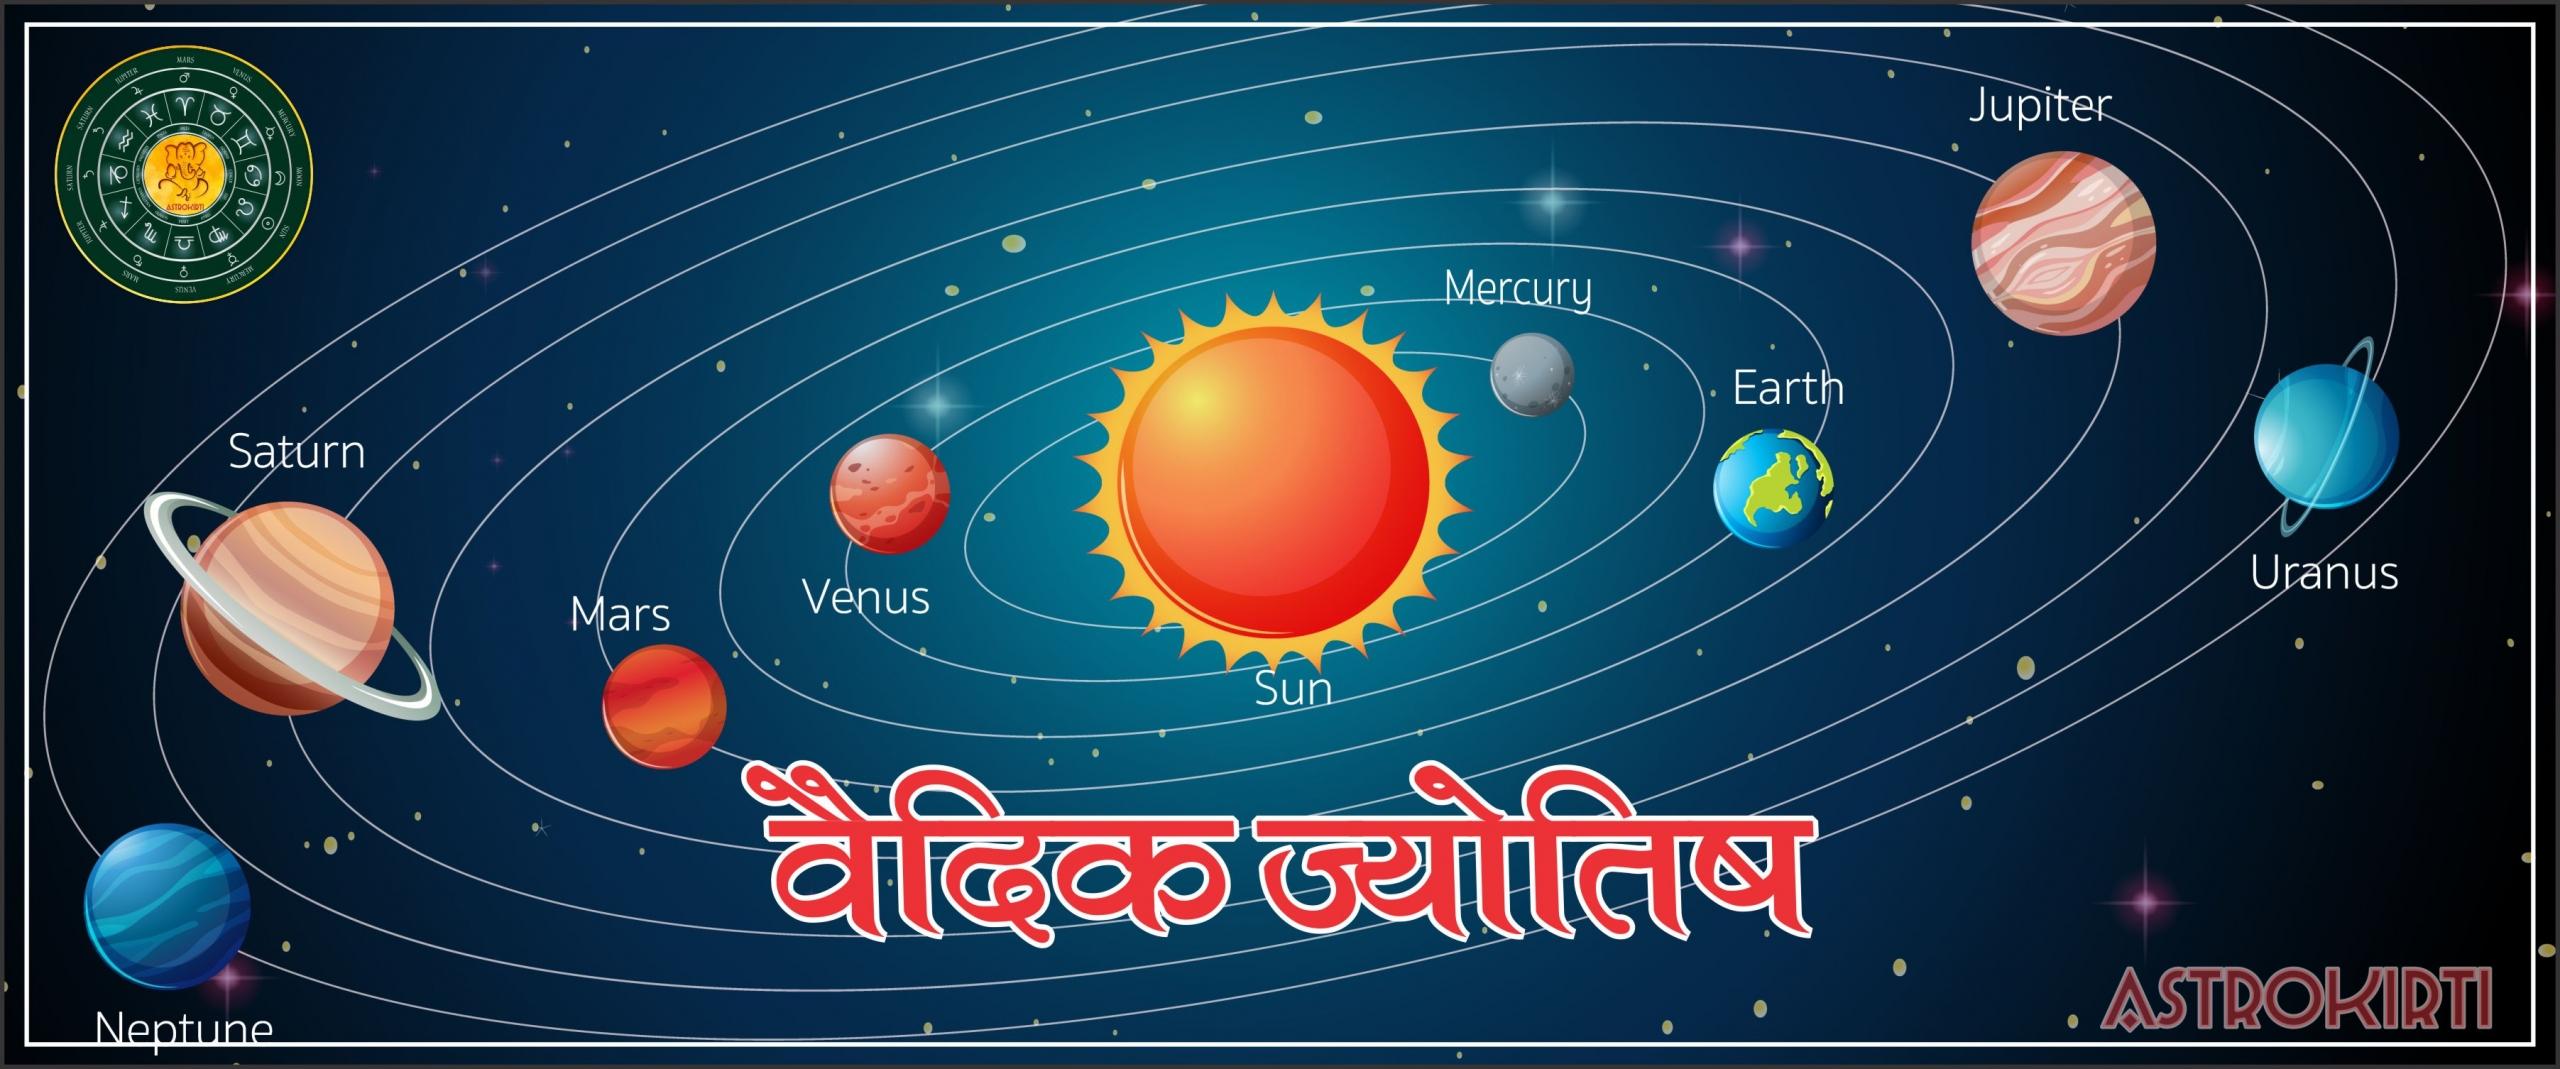 KP Astrology